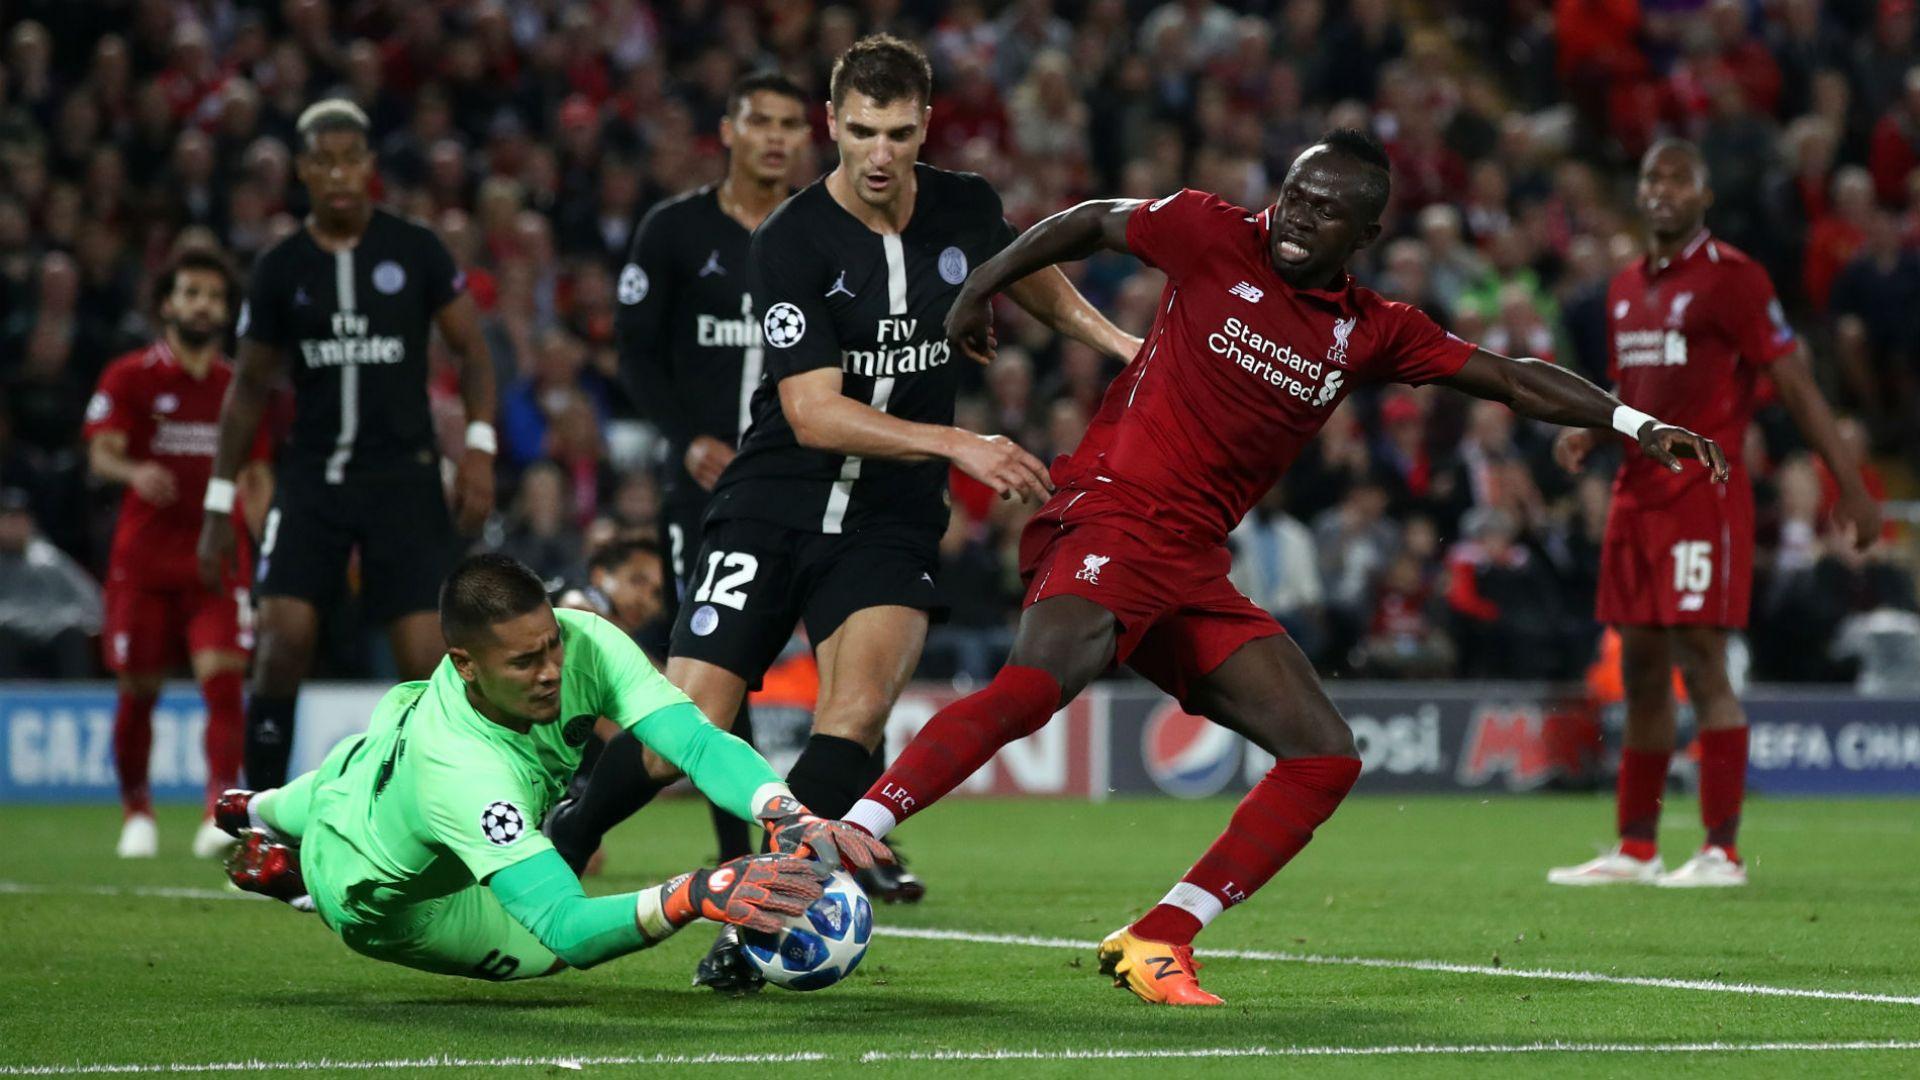 Шампионска лига ни поднася нови осем битки